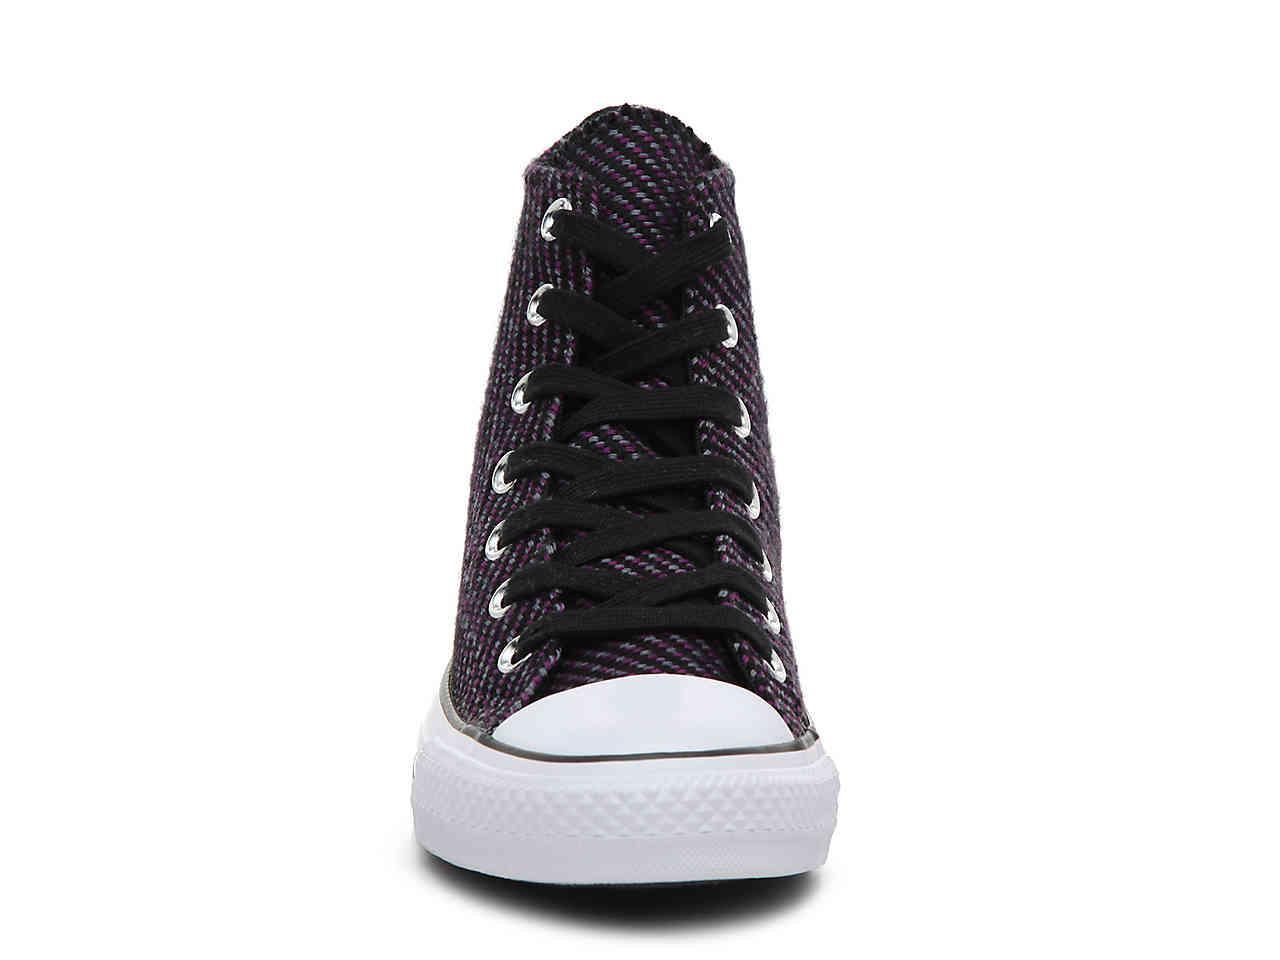 2ccf4441ce0dc7 Converse - Black Chuck Taylor All Star Knit High-top Sneaker - Lyst. View  fullscreen